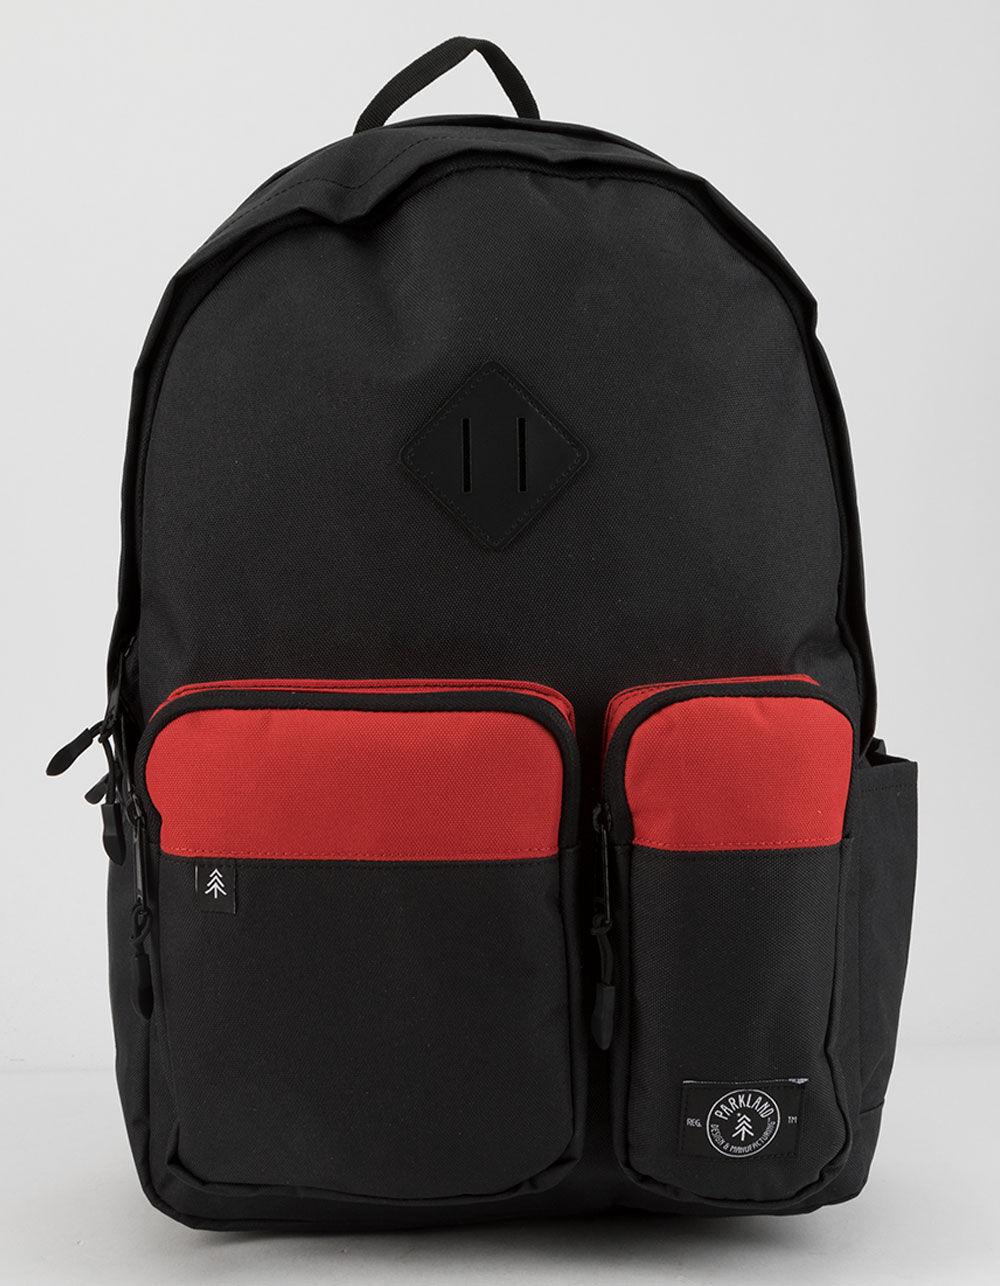 PARKLAND Academy Volcano Backpack